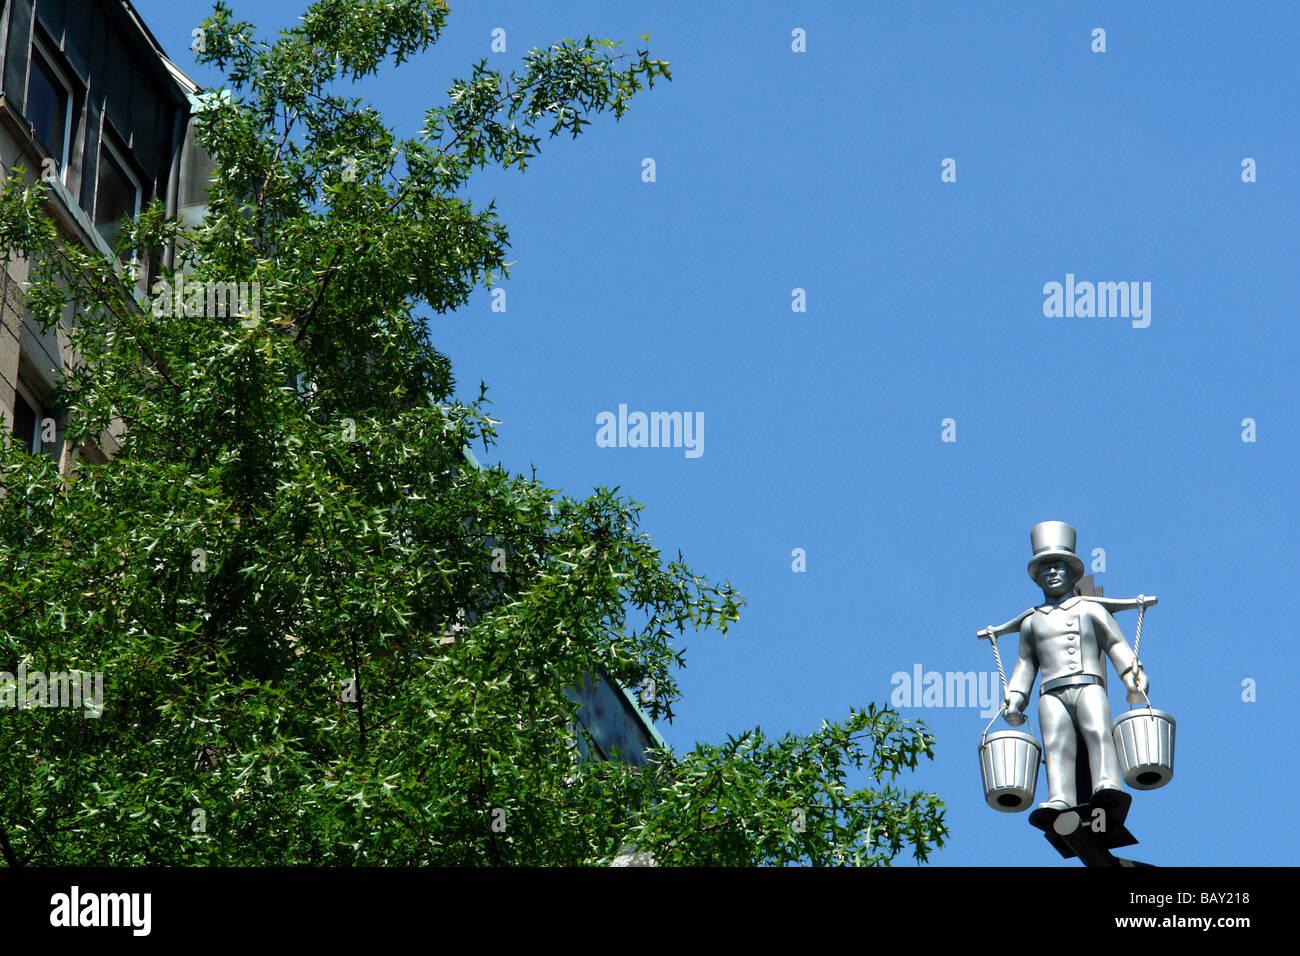 Hans Hummel memorial, Hamburg, Germany - Stock Image